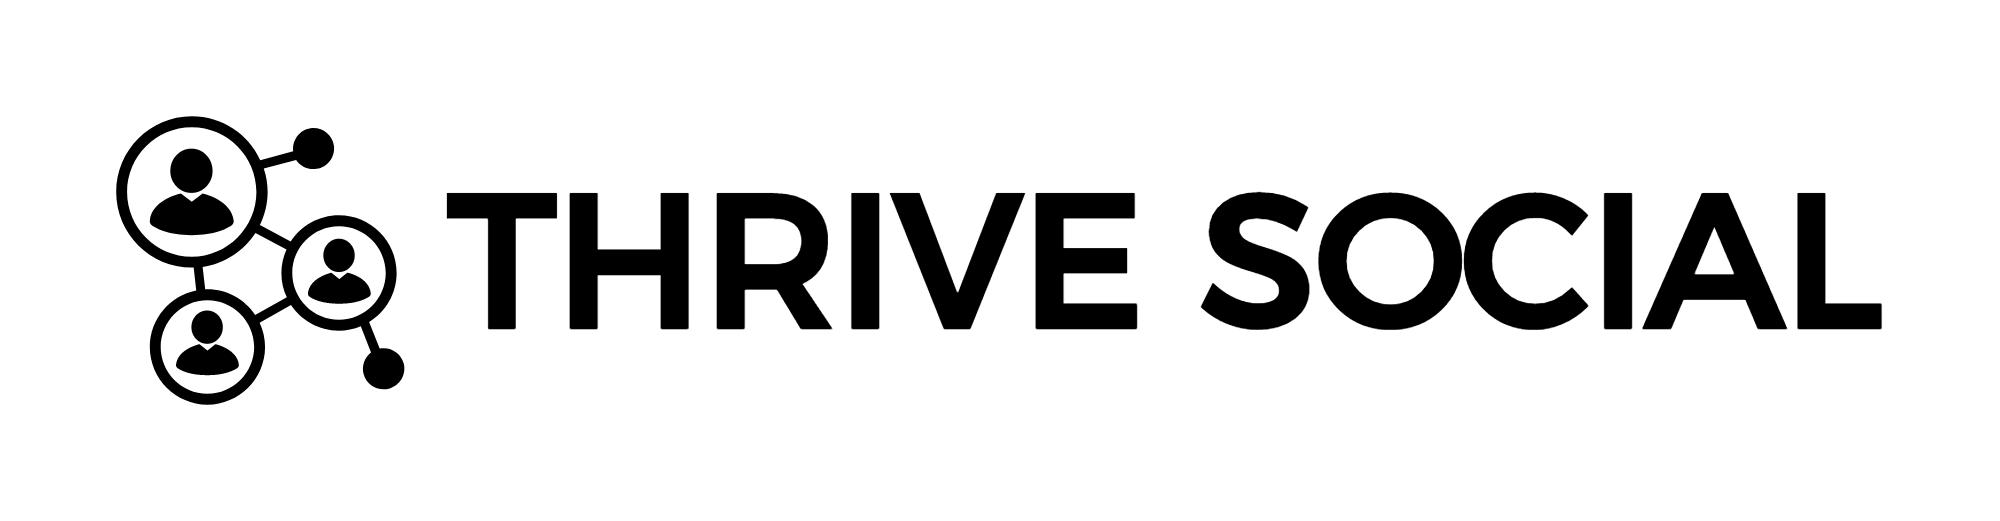 logo-black-on-white.png